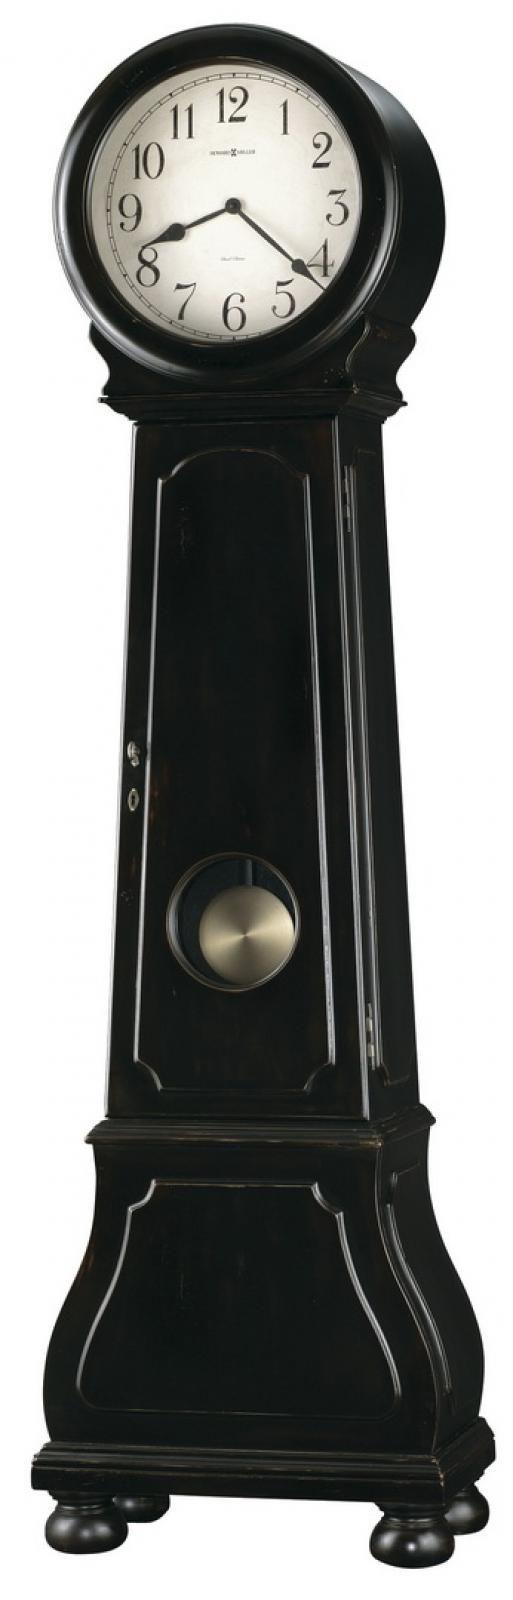 Clockway: Howard Miller Chiming Grandfather Clock - CHM1366